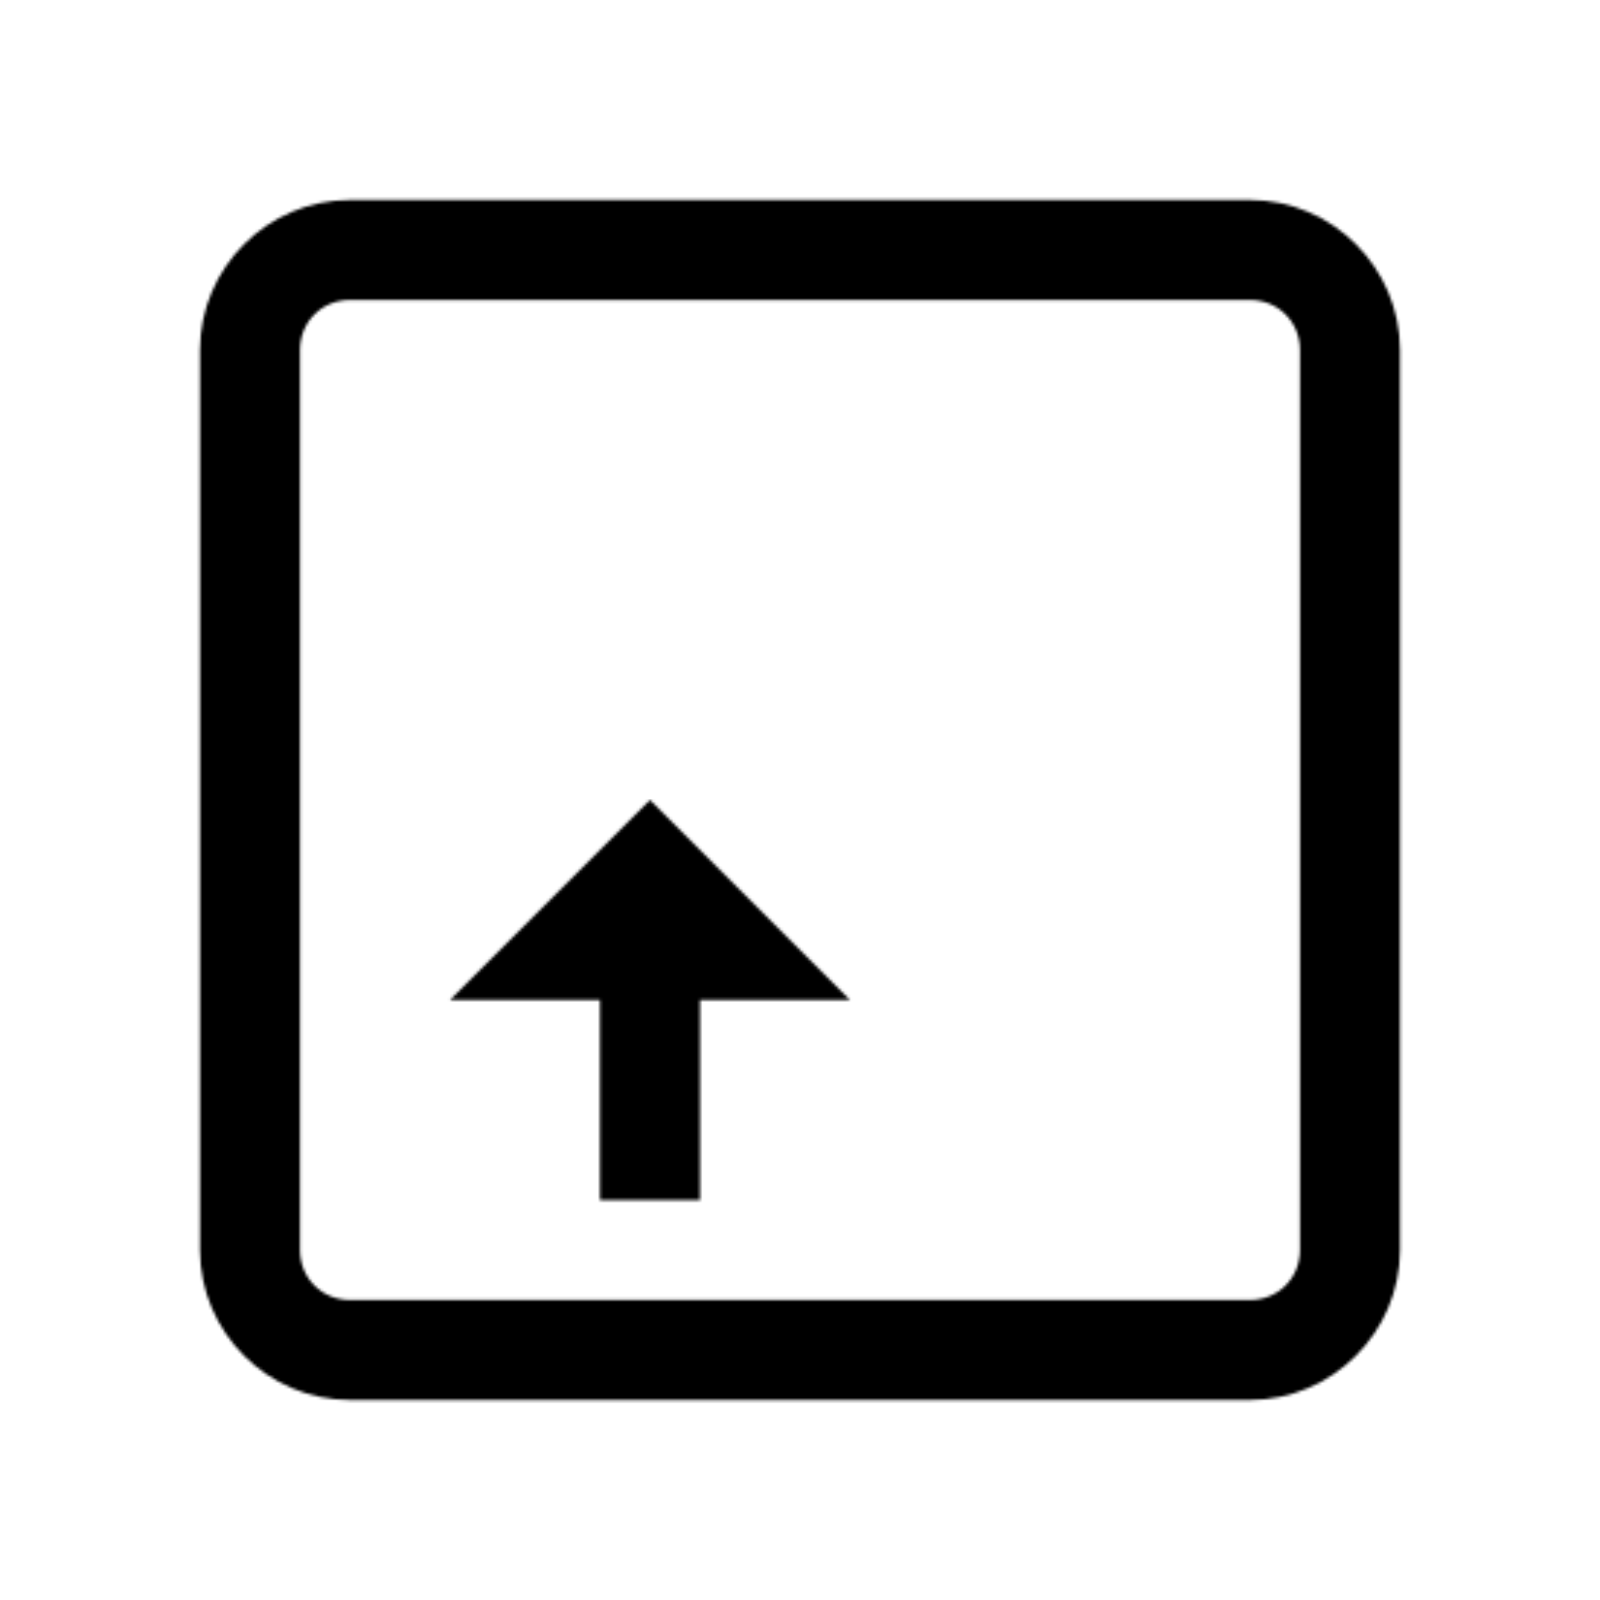 Shift Mac icon